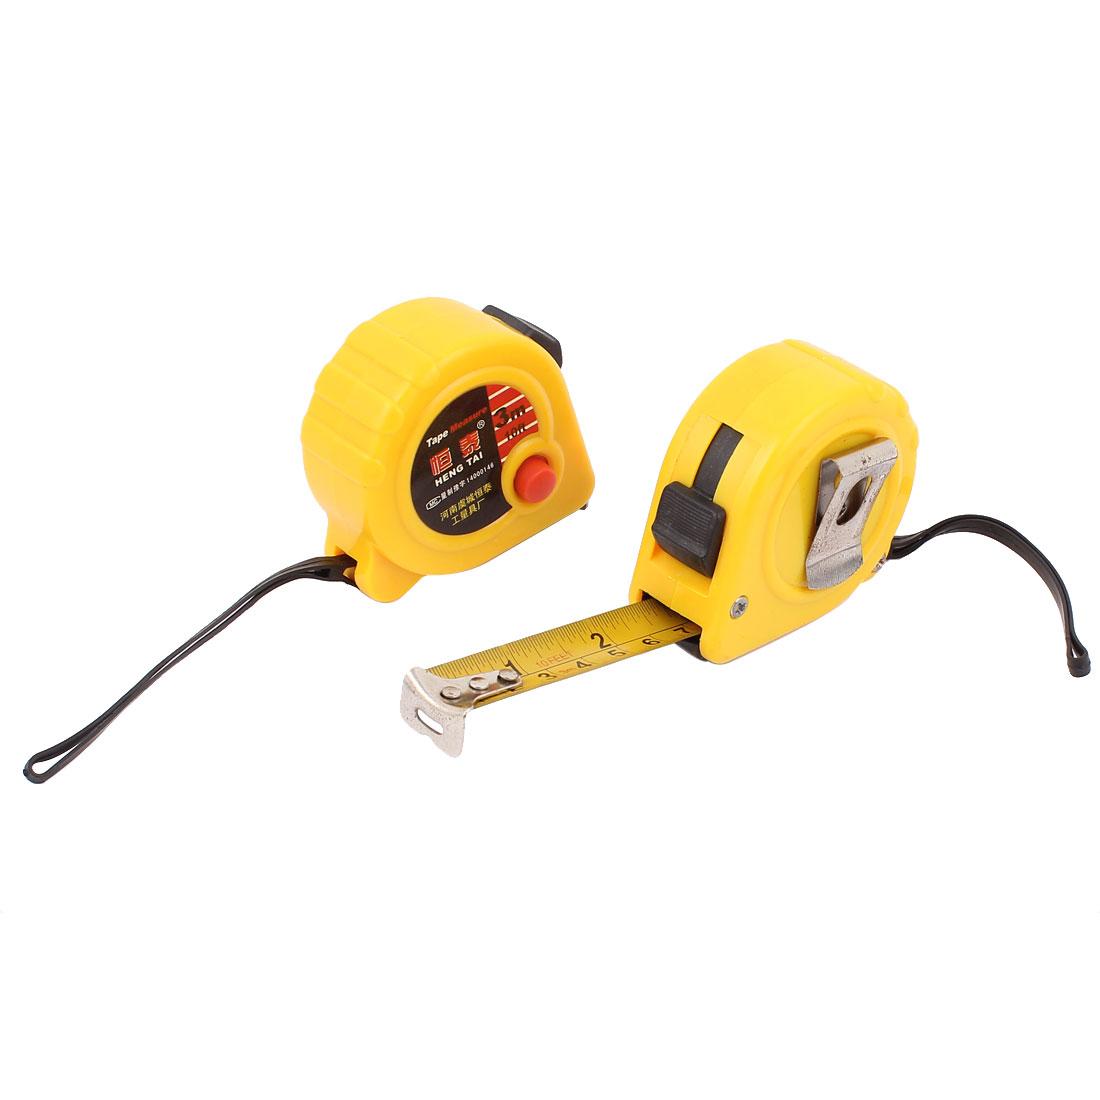 3Meters 10Ft Yellow Plastic Housing Retractable Lock Button Ruler Metric Measure Tape w String 2pcs